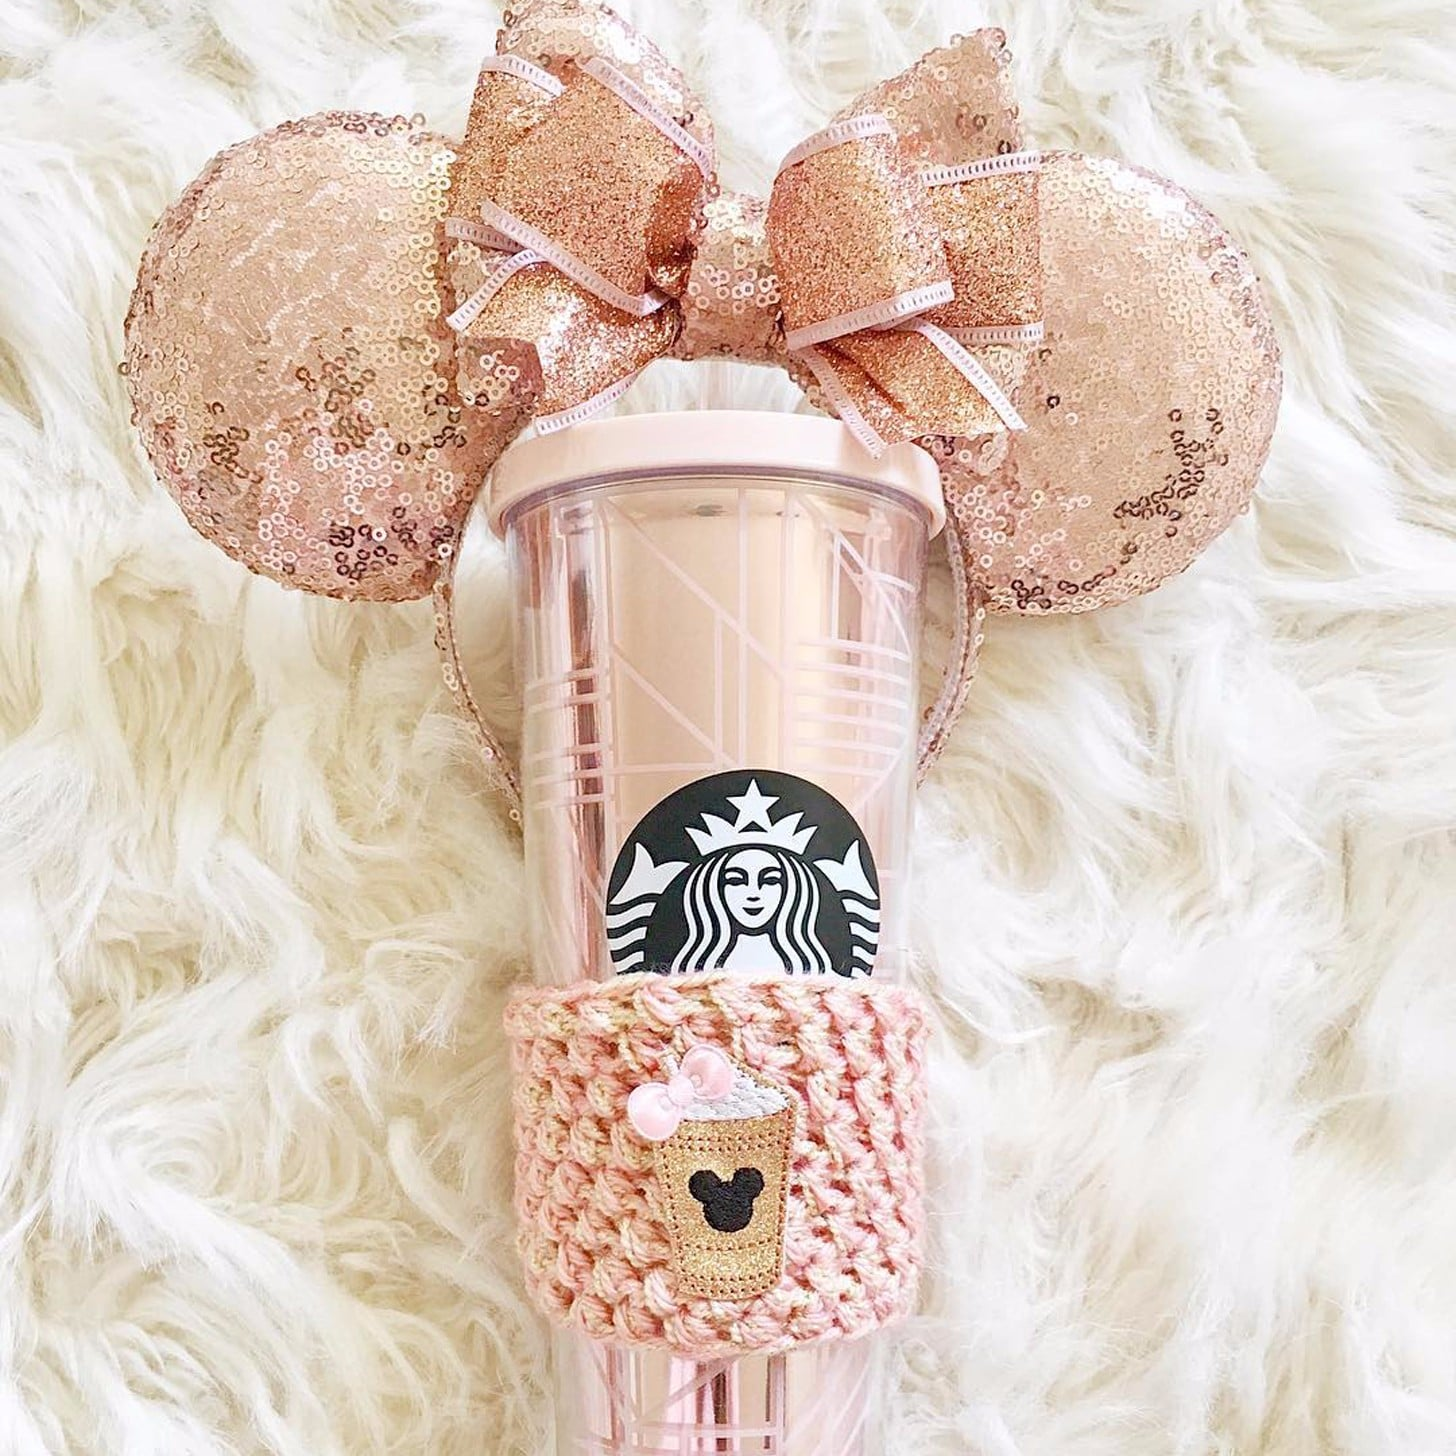 Starbucks Rose Gold Geometric Tumbler 2017 Popsugar Food